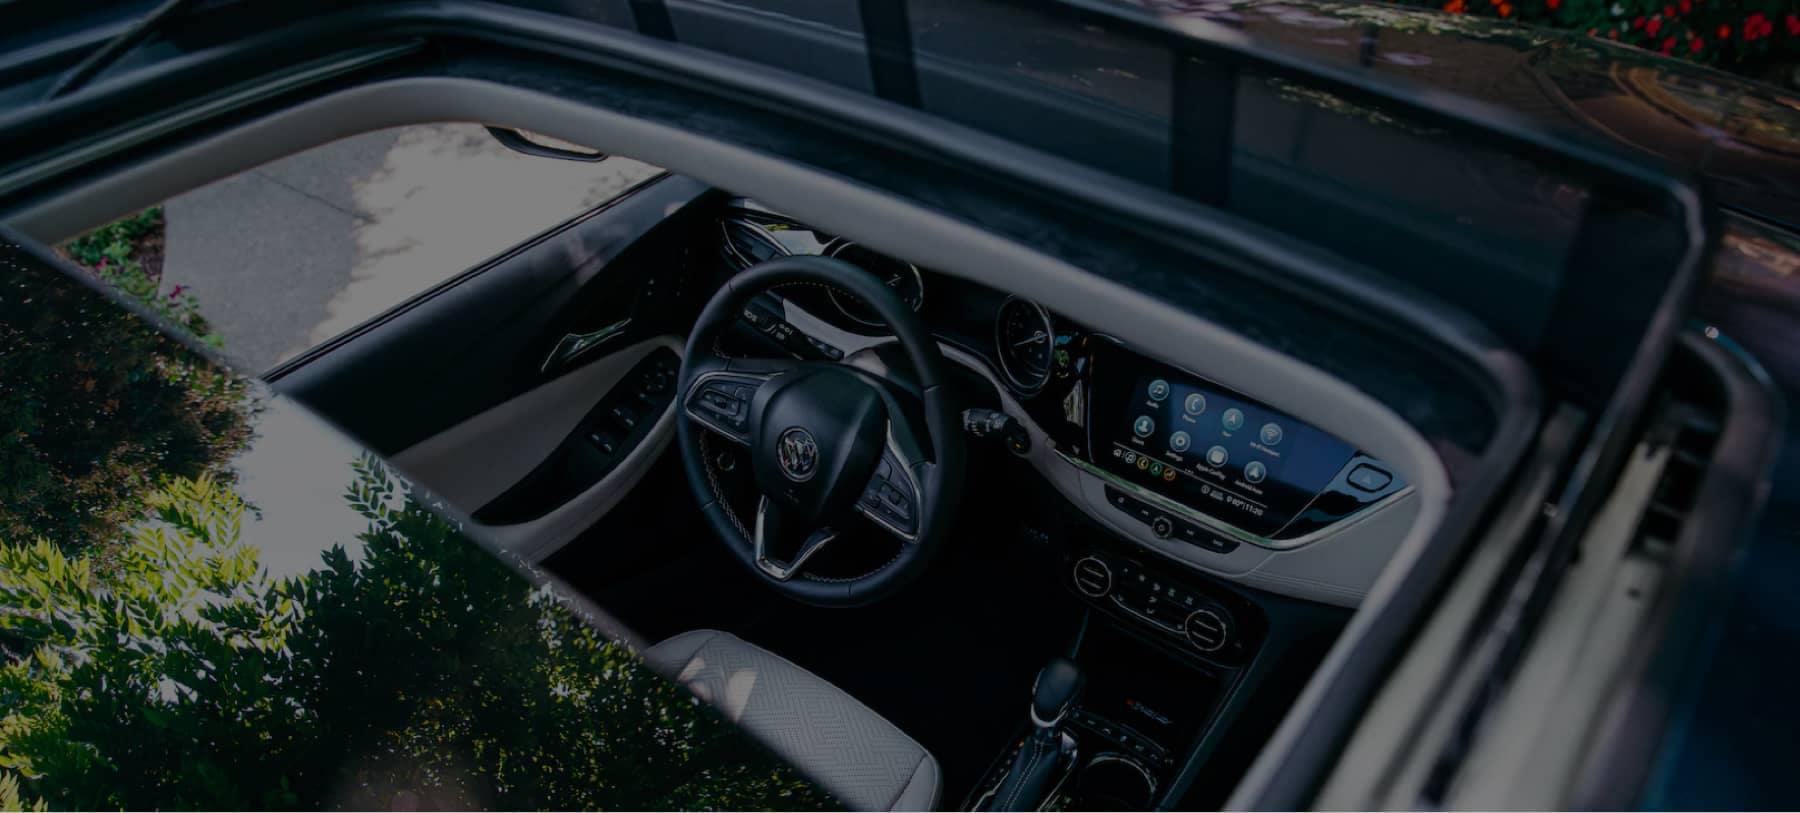 Everett Chevrolet Buick GMC car sunroof